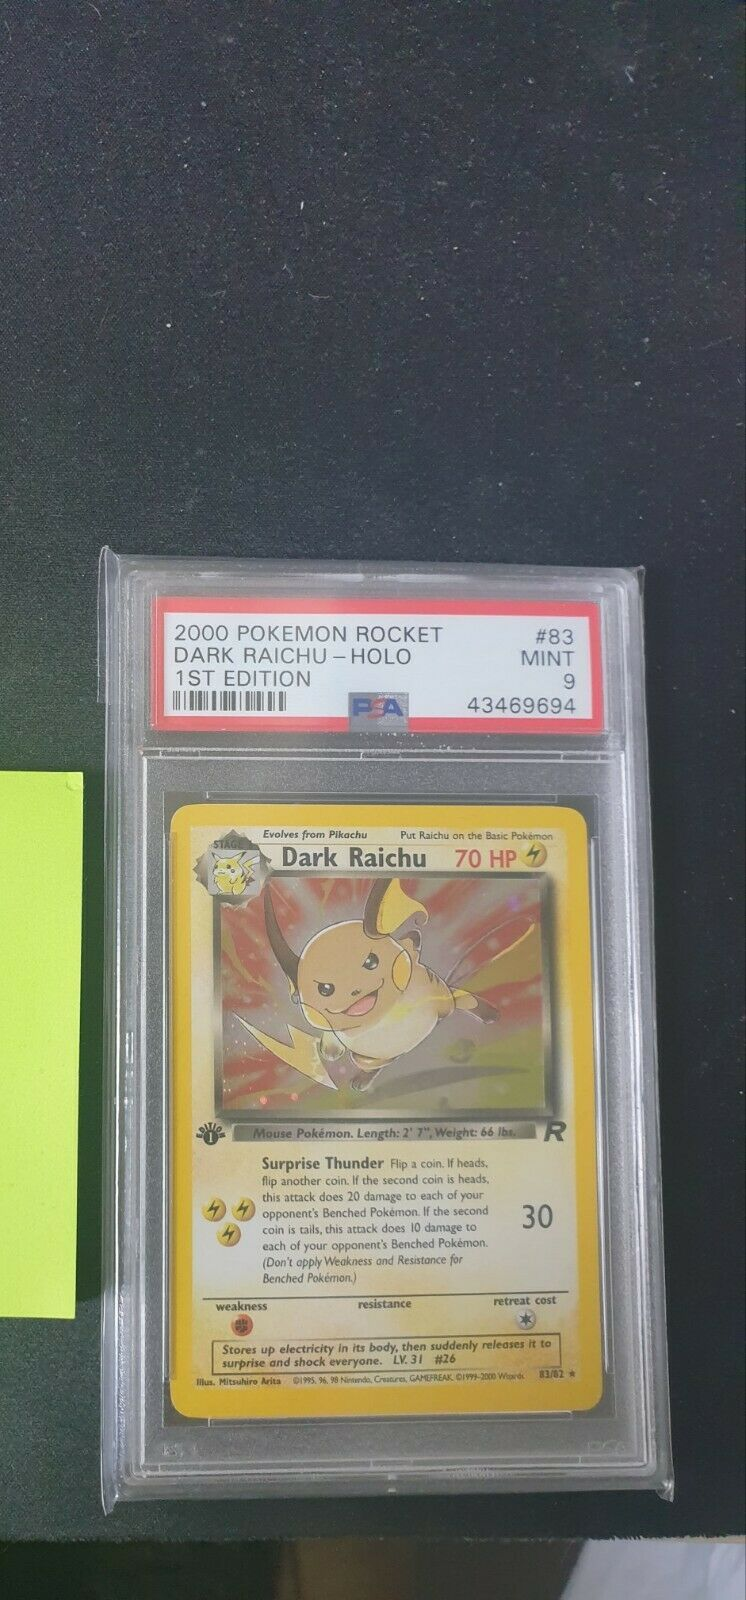 Pokemon Dark Raichu Holo PSA 9 1st edition